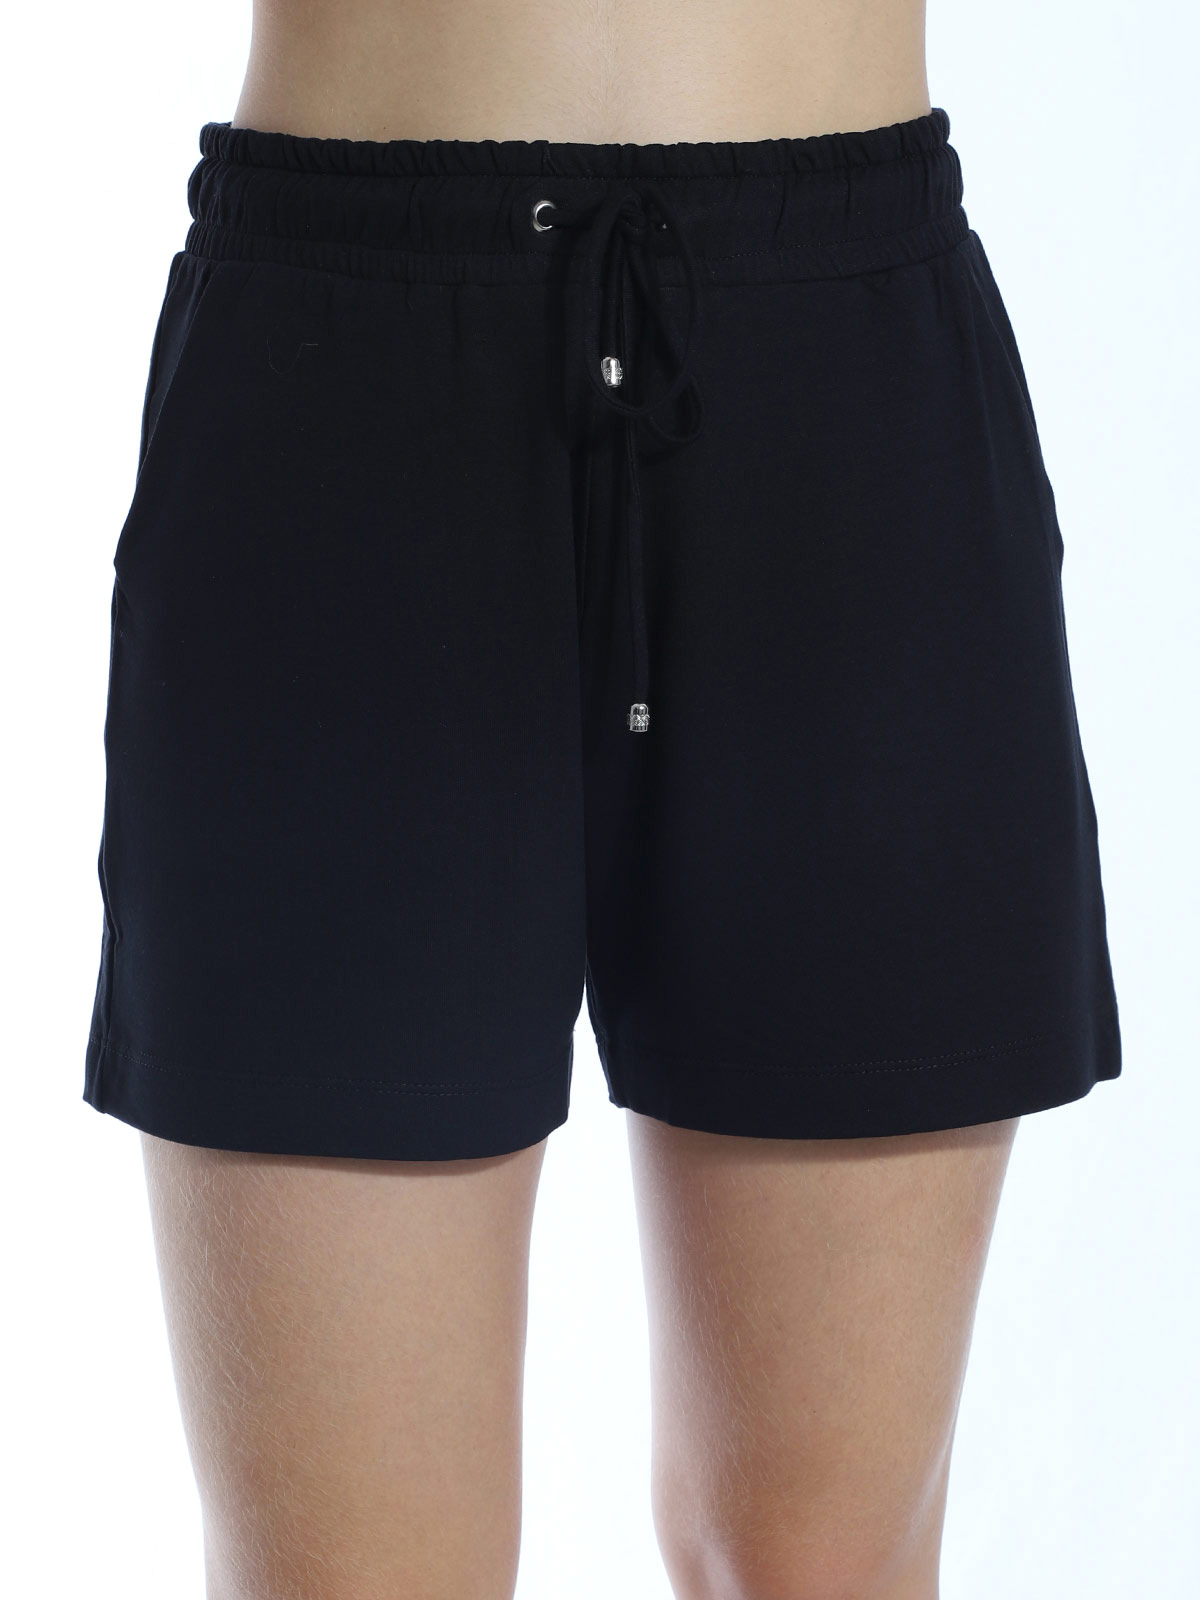 Shorts Feminino Moletom Visco Confortável Soltinho Preto